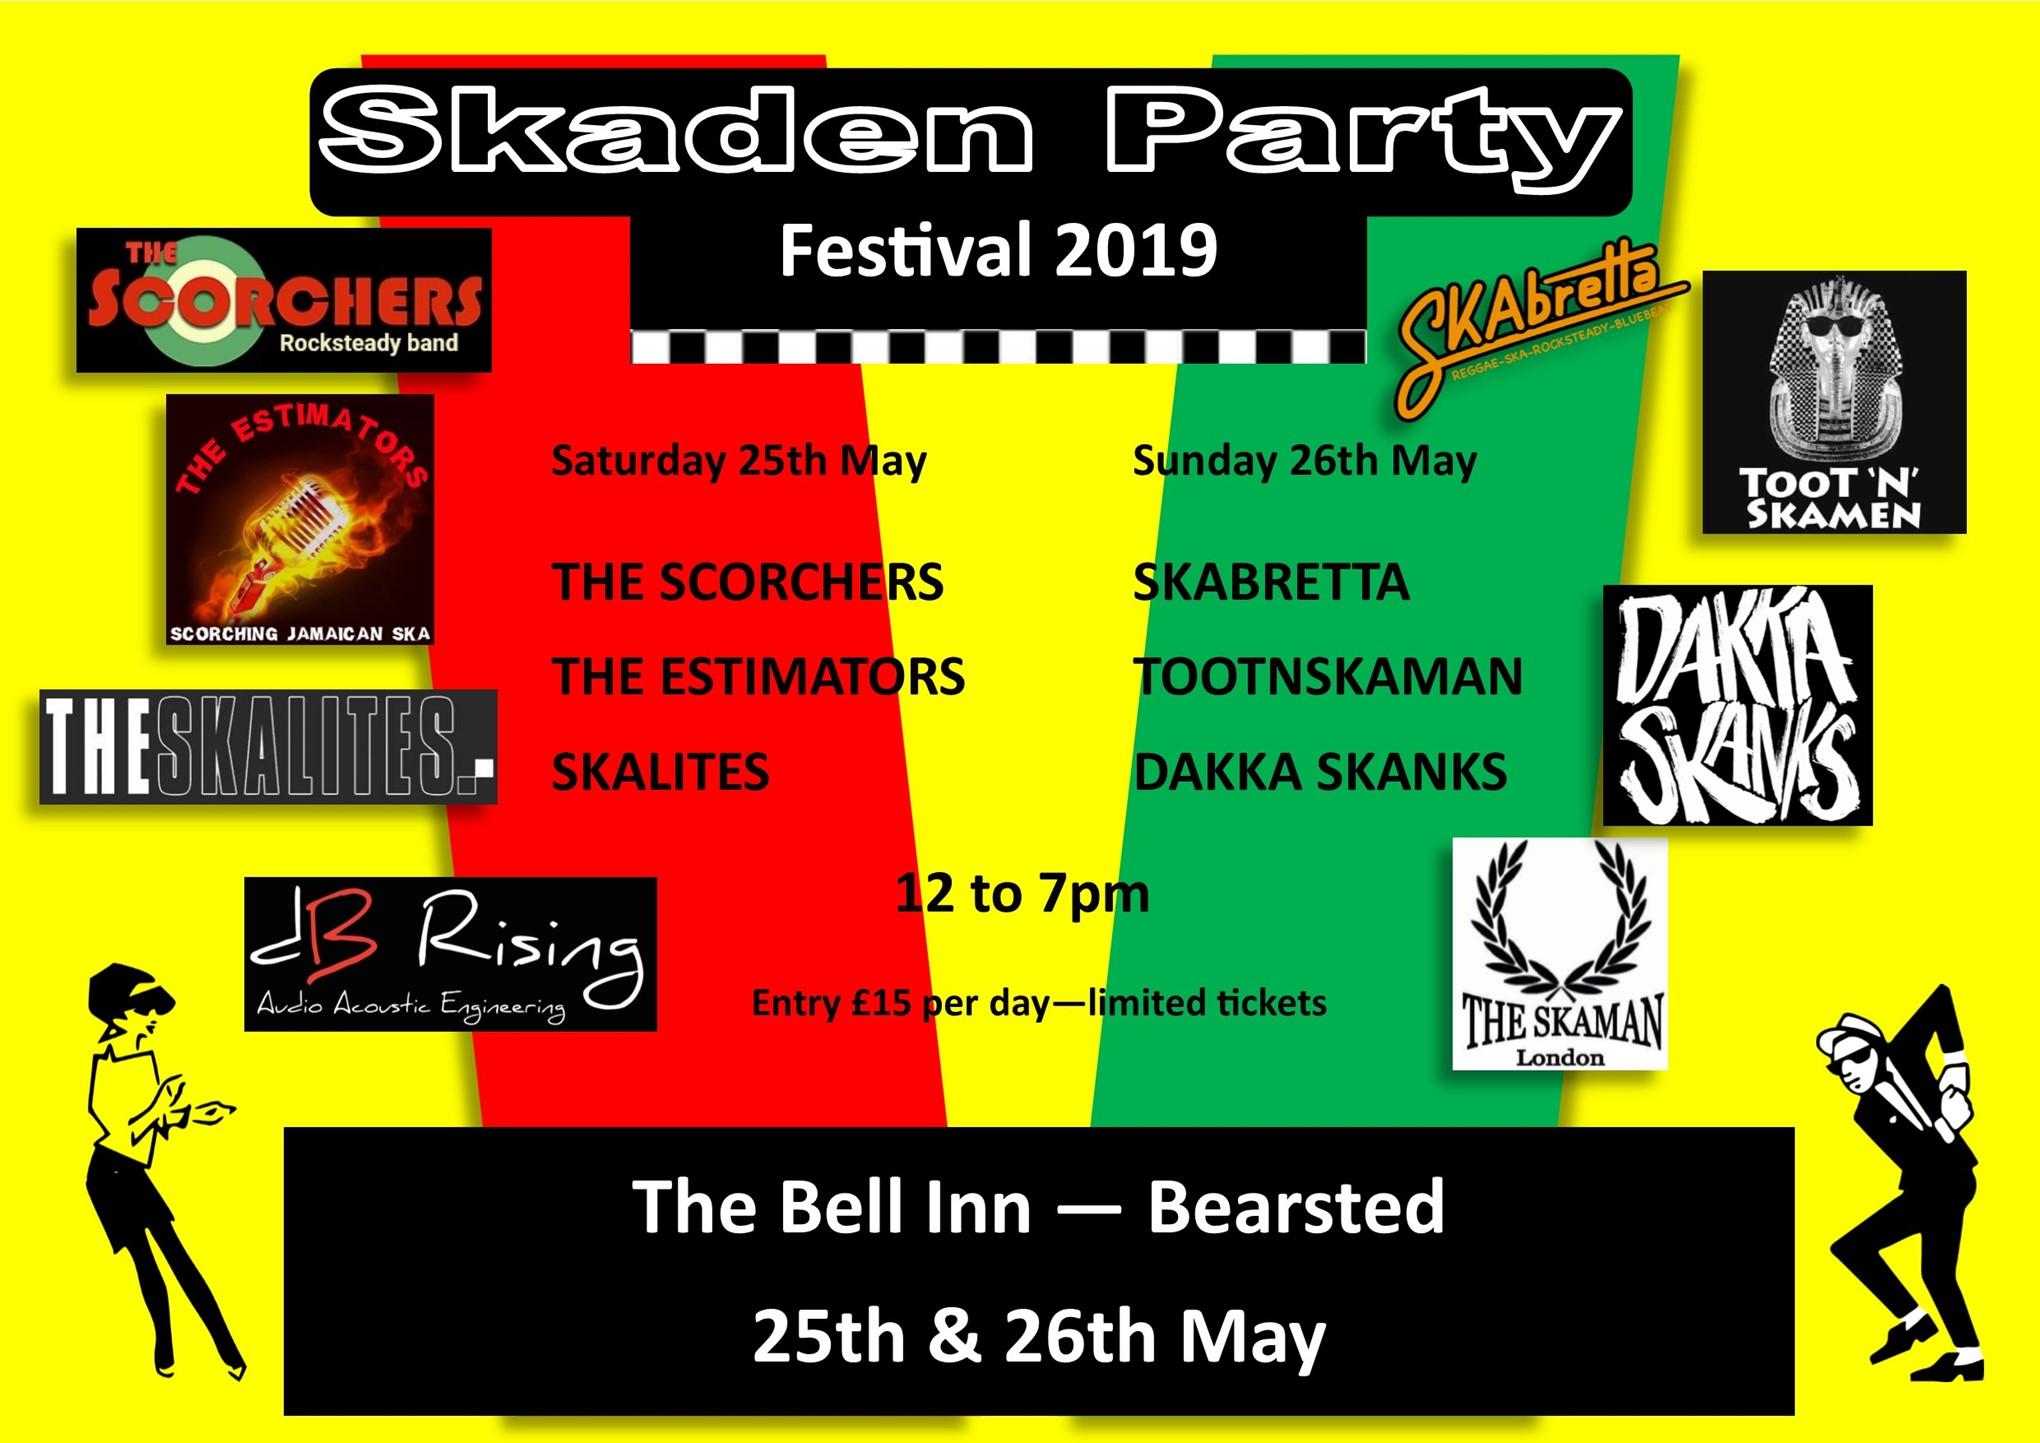 Bearsted's Skaden Party 2019